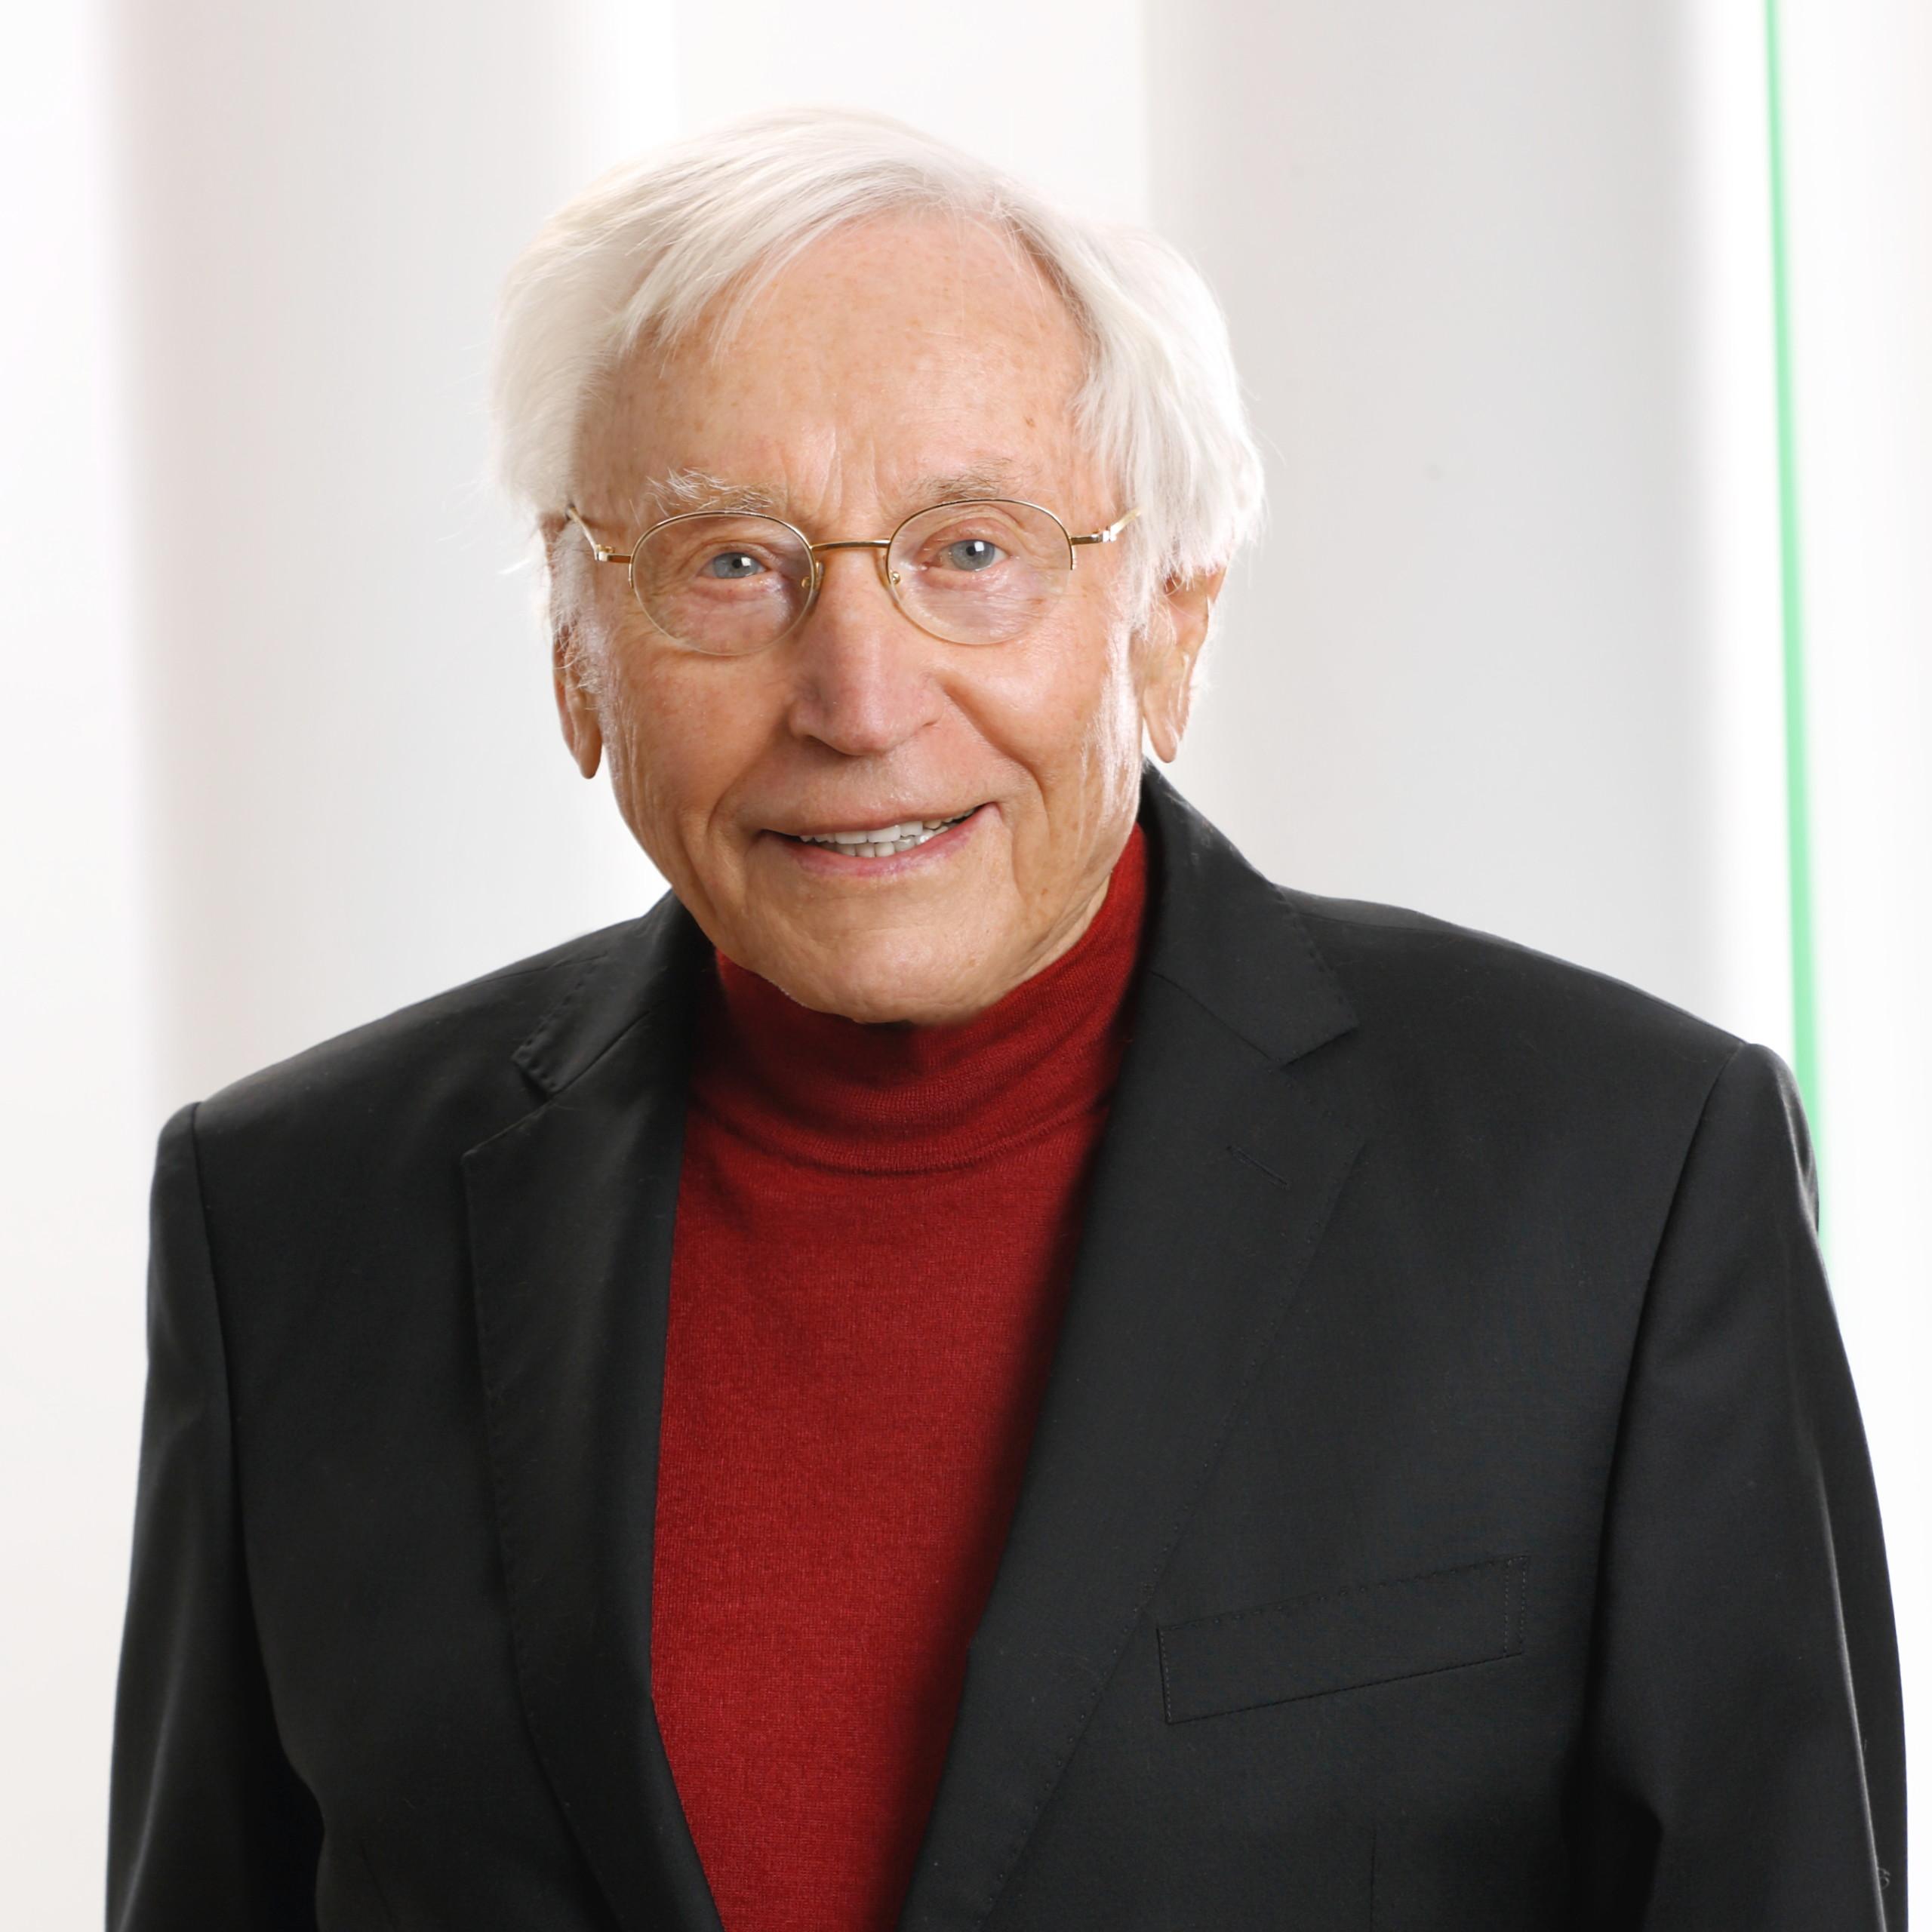 Guenter Reichold